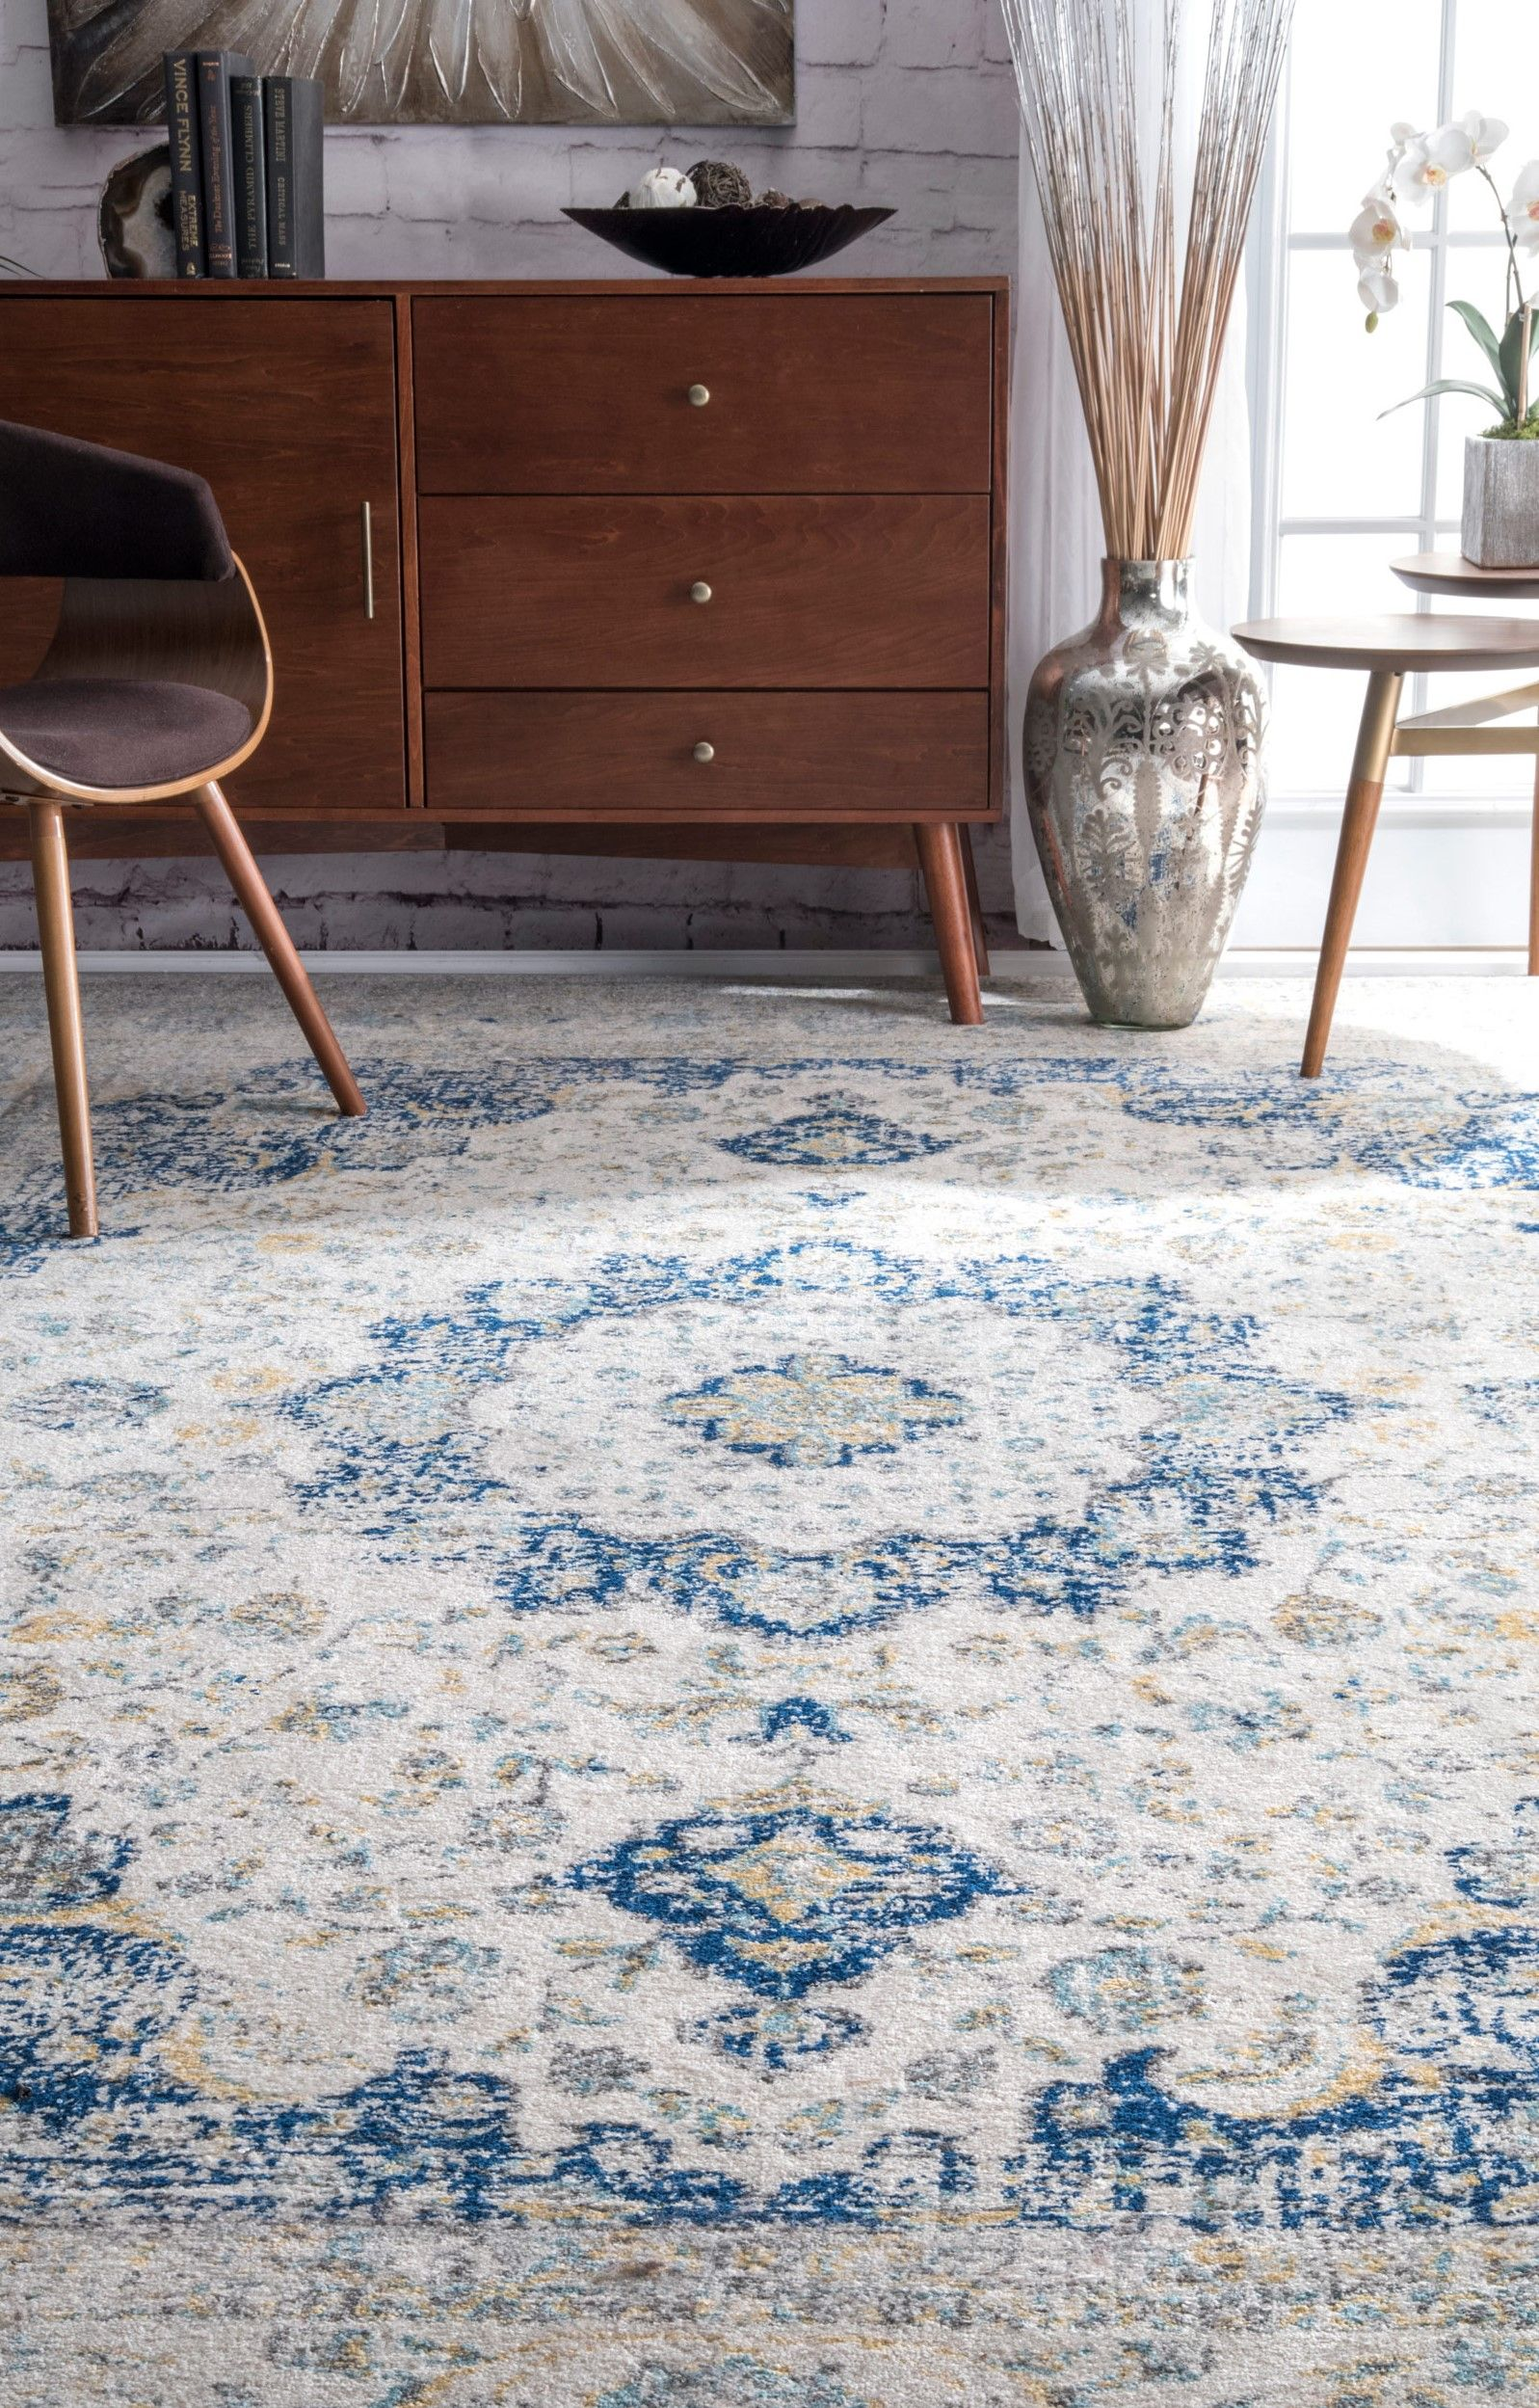 Teppich Emely In Blau Grau In 2019 Deko Der Perfekte Teppich